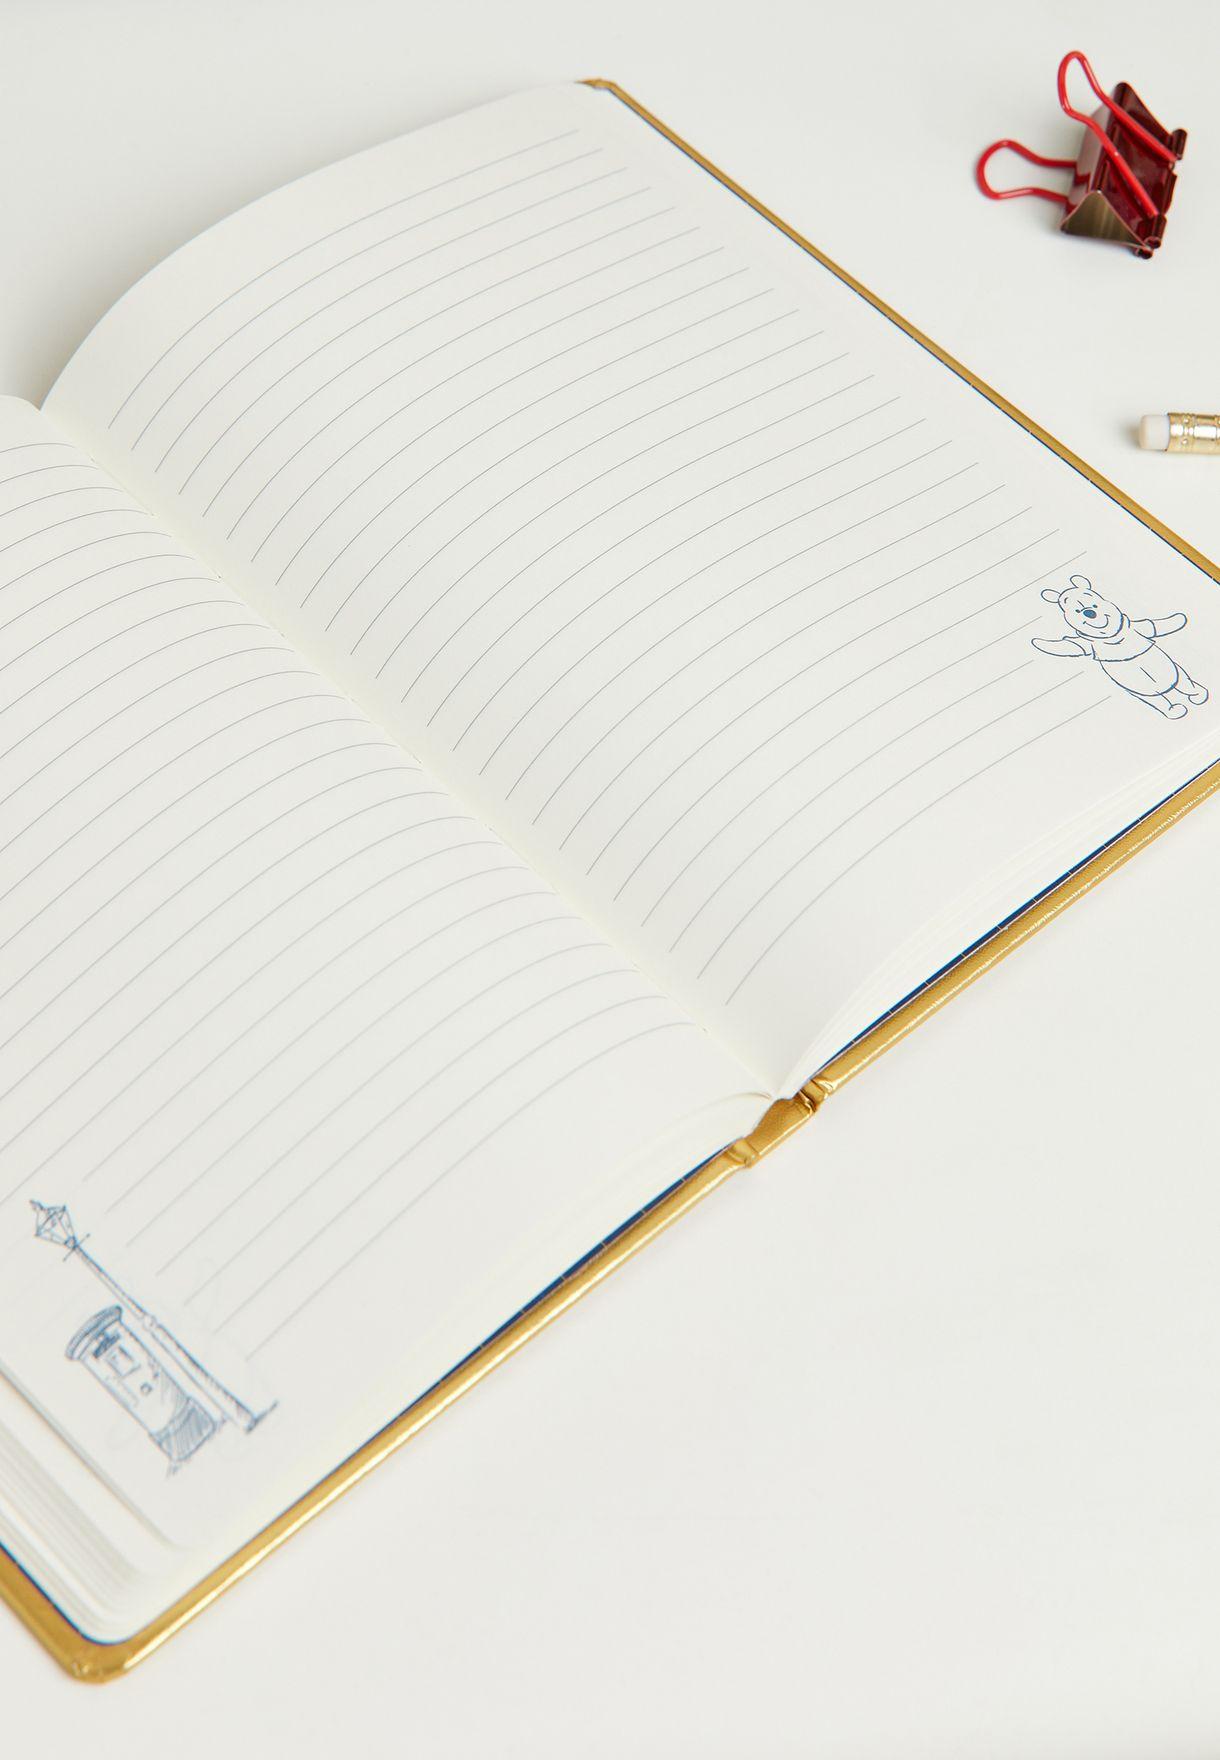 دفتر ملاحظات ويني الدبدوب A5